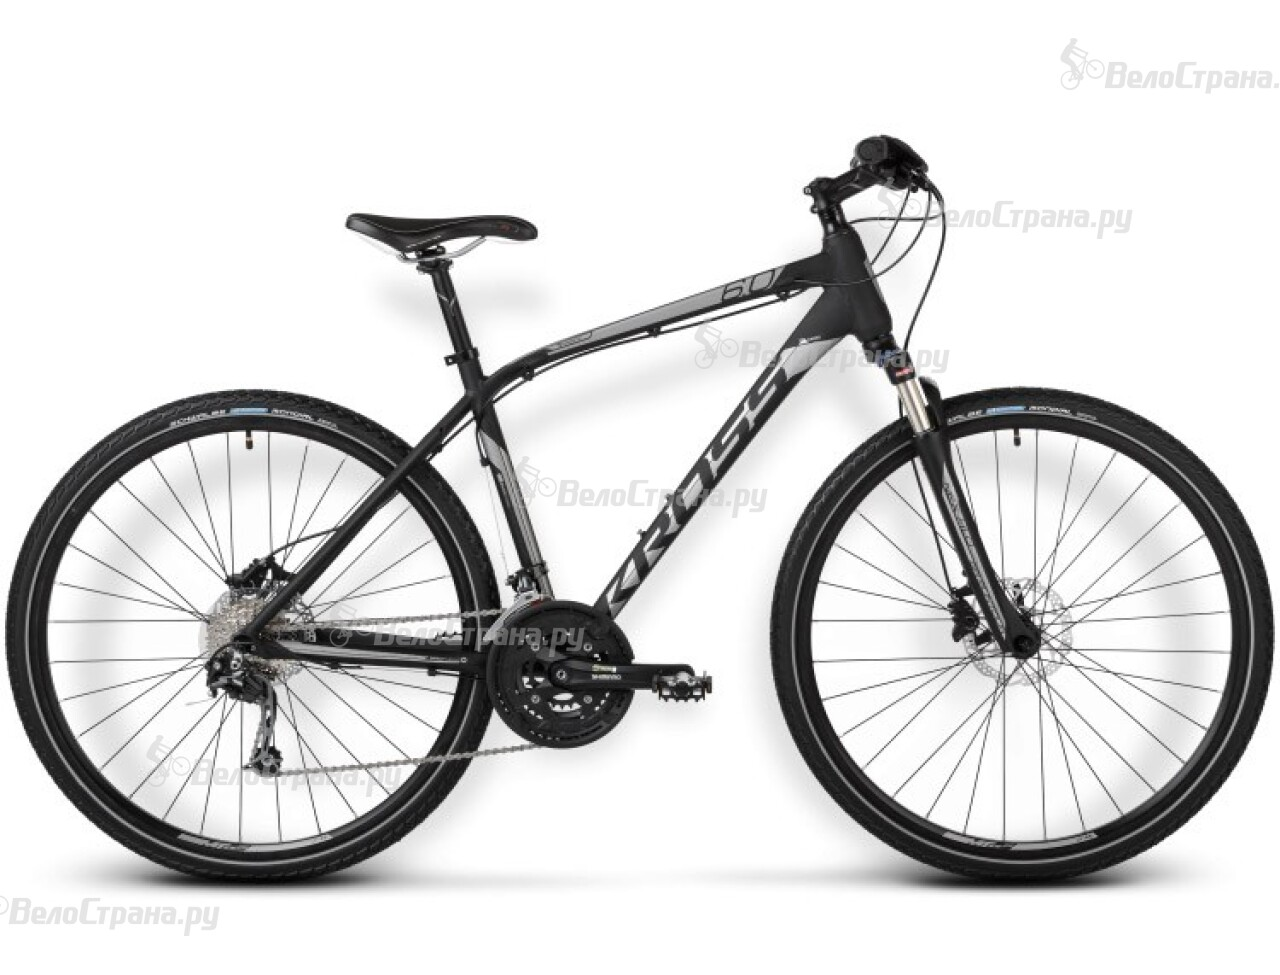 Велосипед Kross Evado 6.0 (2015) 2015 csm360